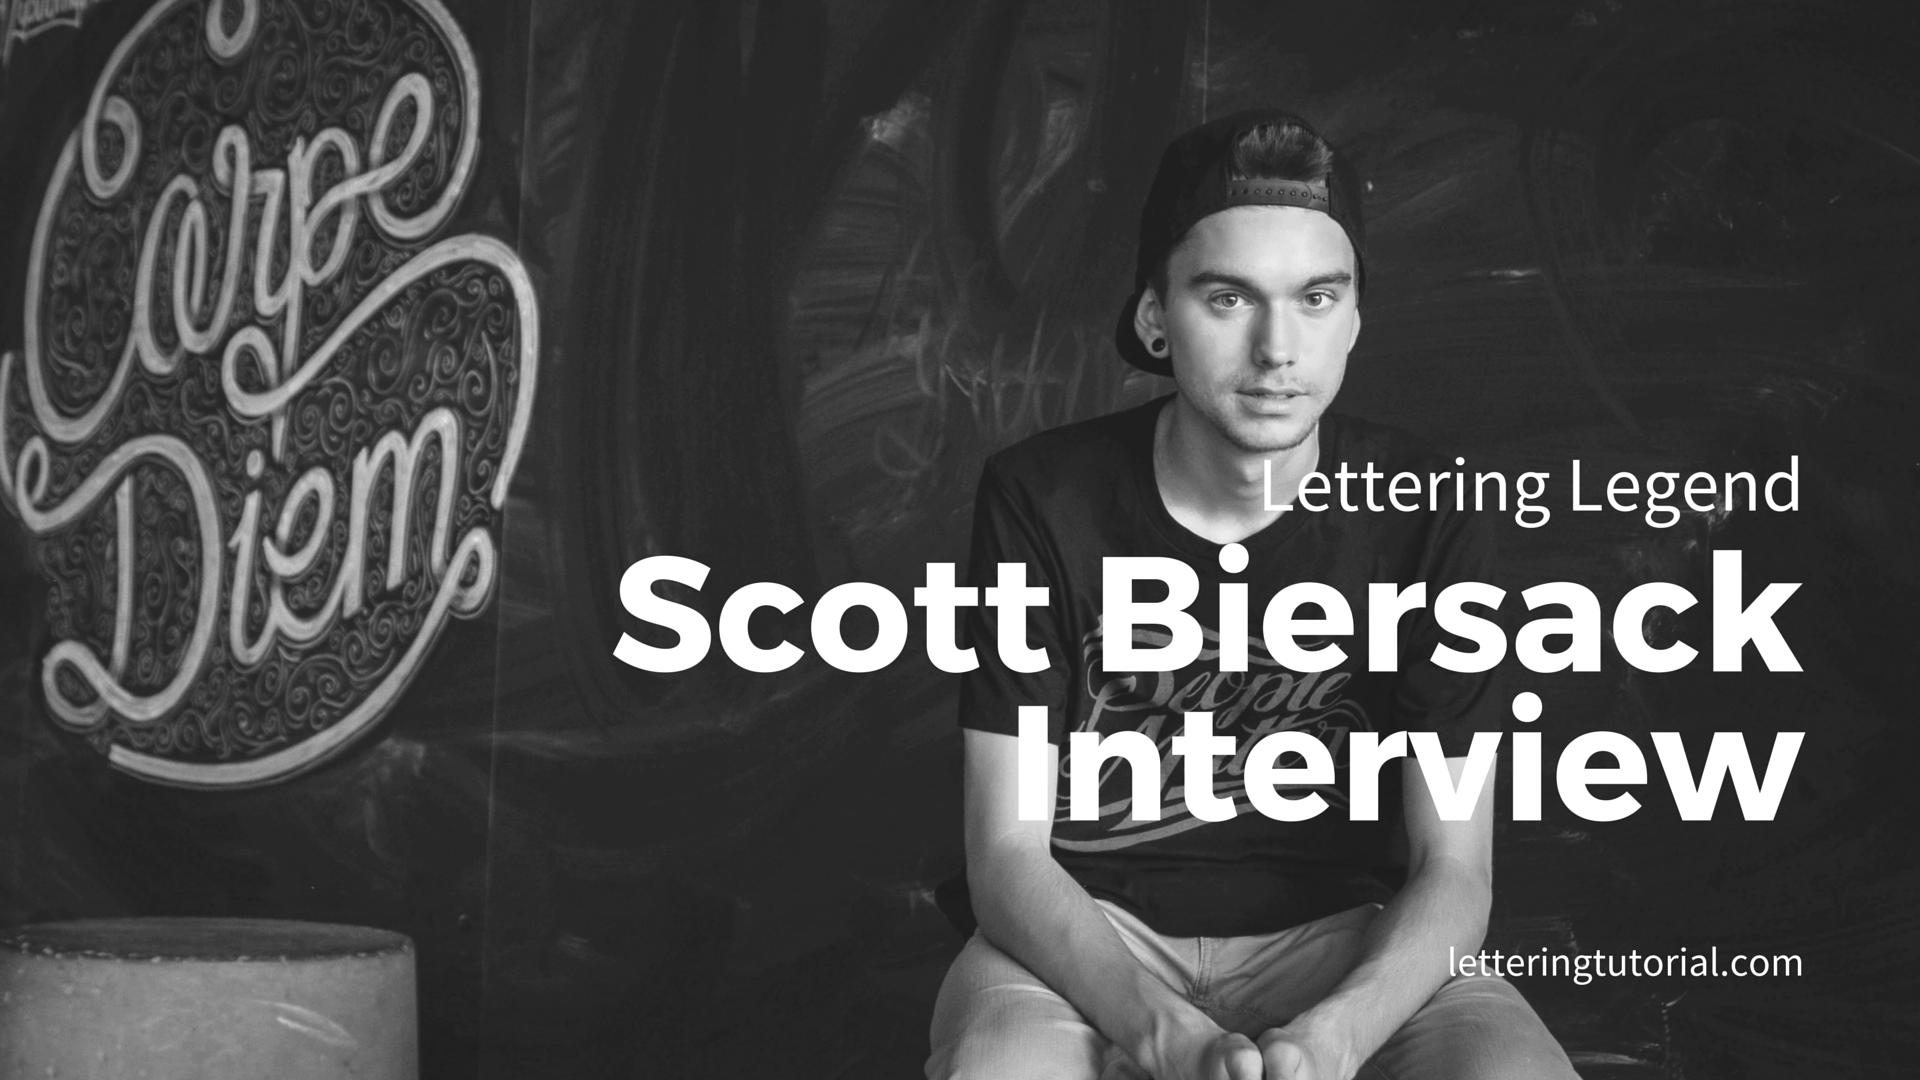 Scott Biersack Interview - Lettering Tutorial